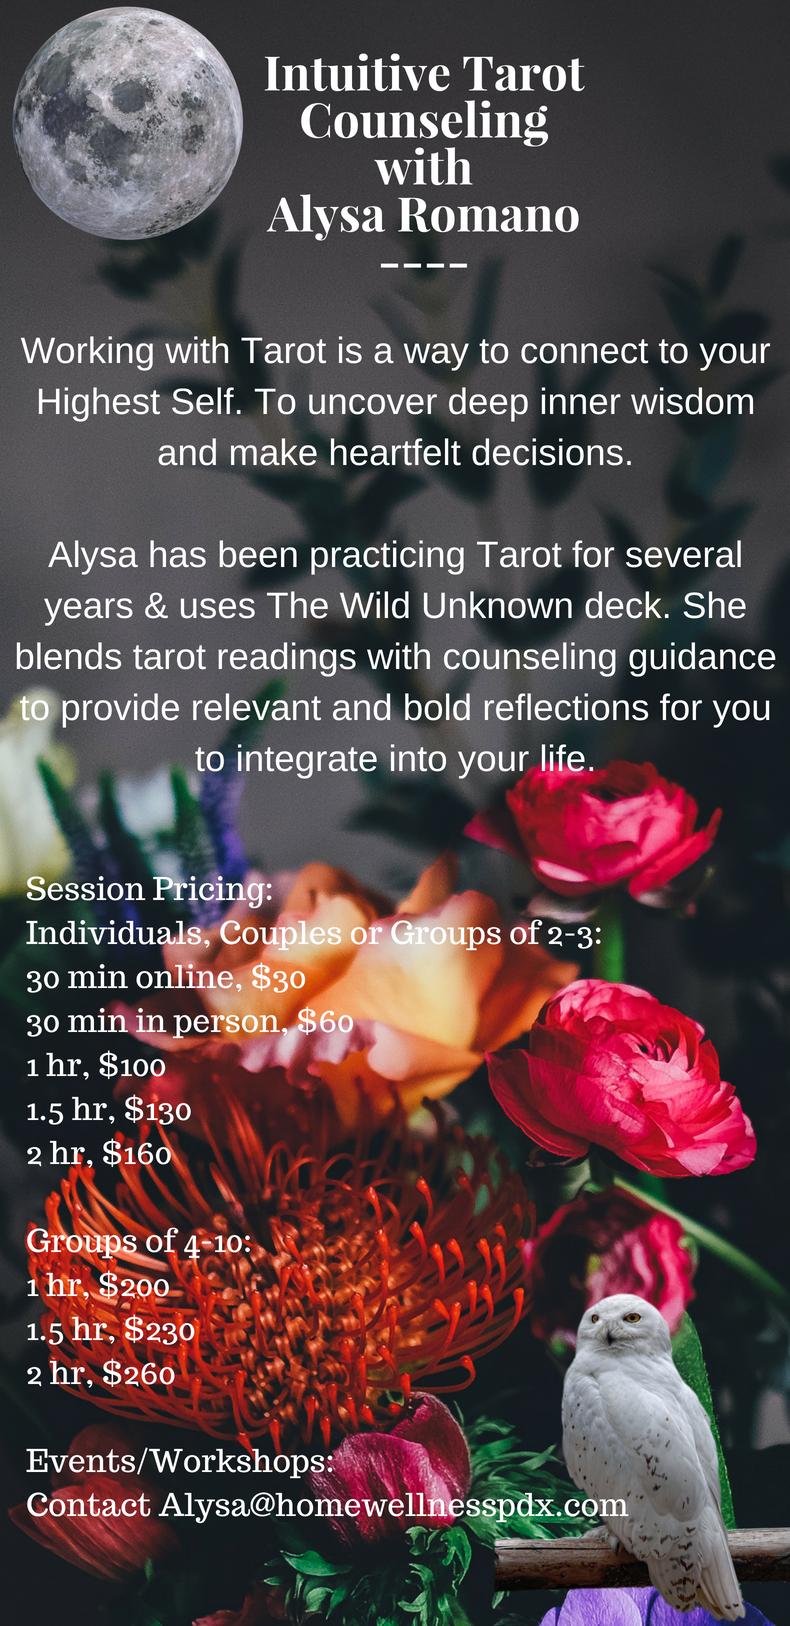 alysa romano tarot sessions.png